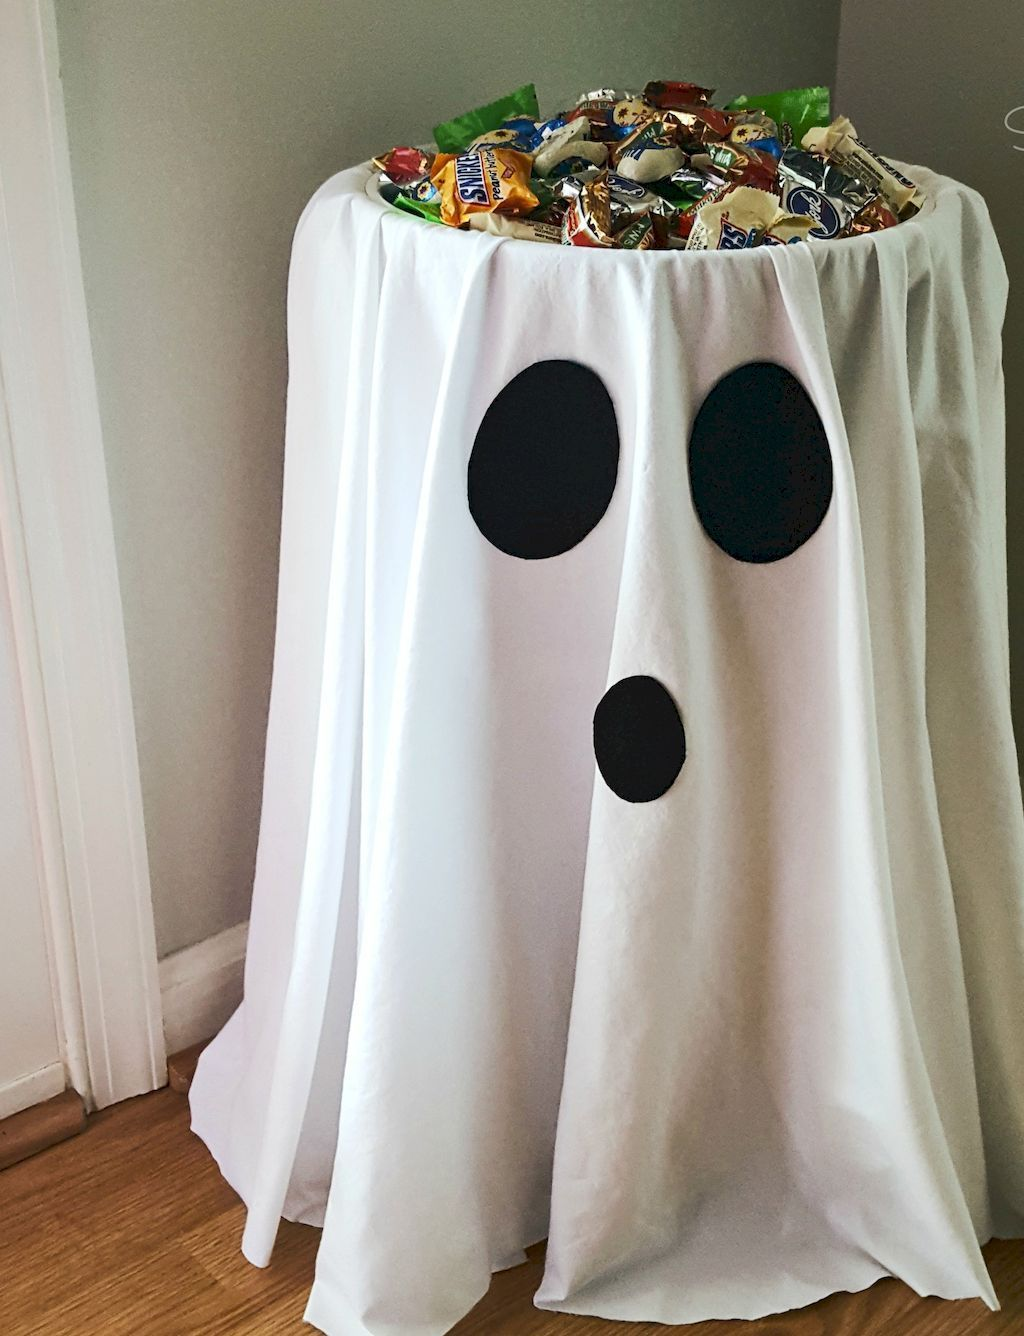 Diy halloween home decor ideas (49) | Halloween | Pinterest | DIY ...